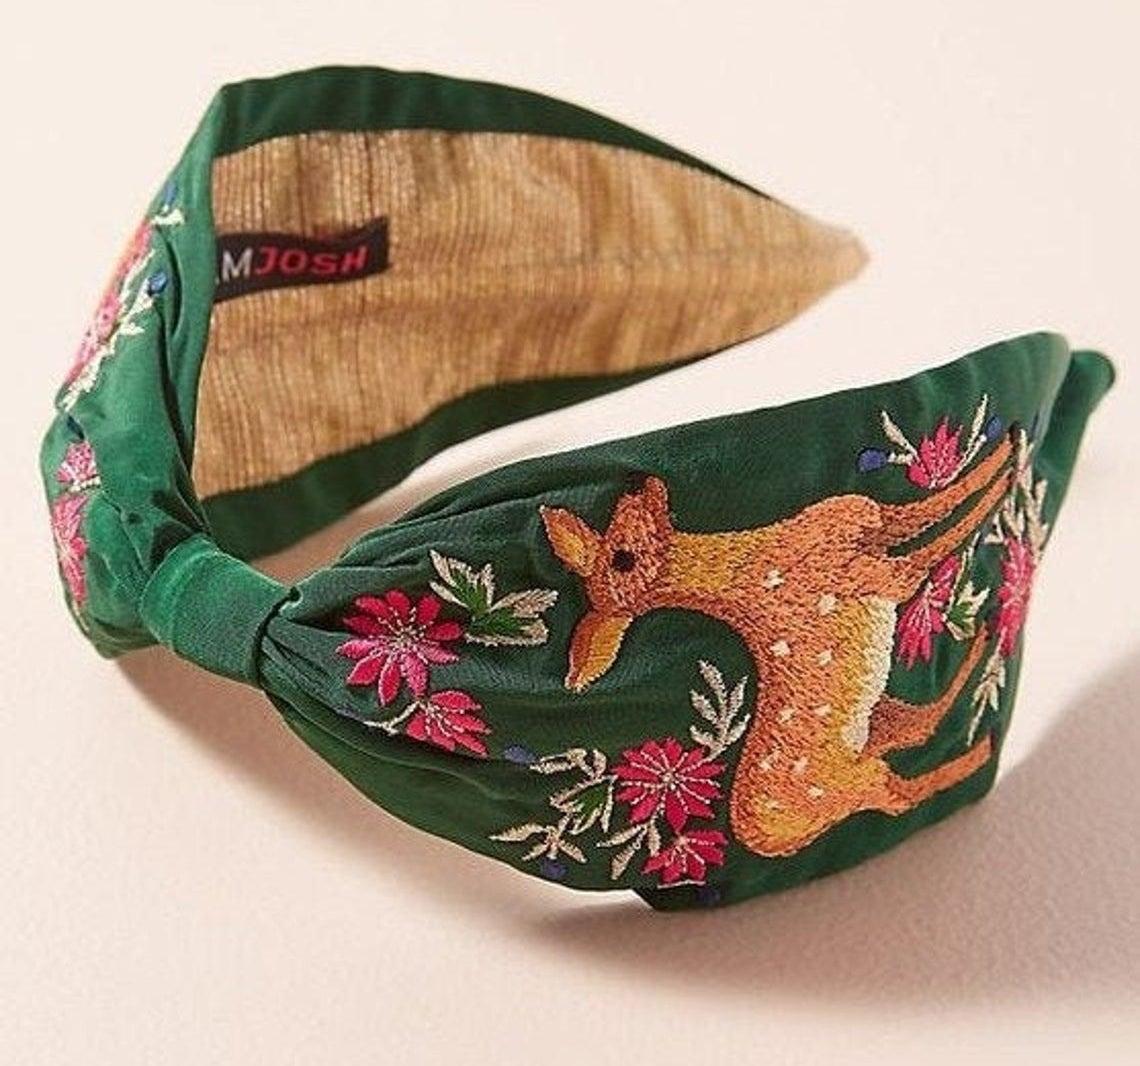 The deer embroidered headband